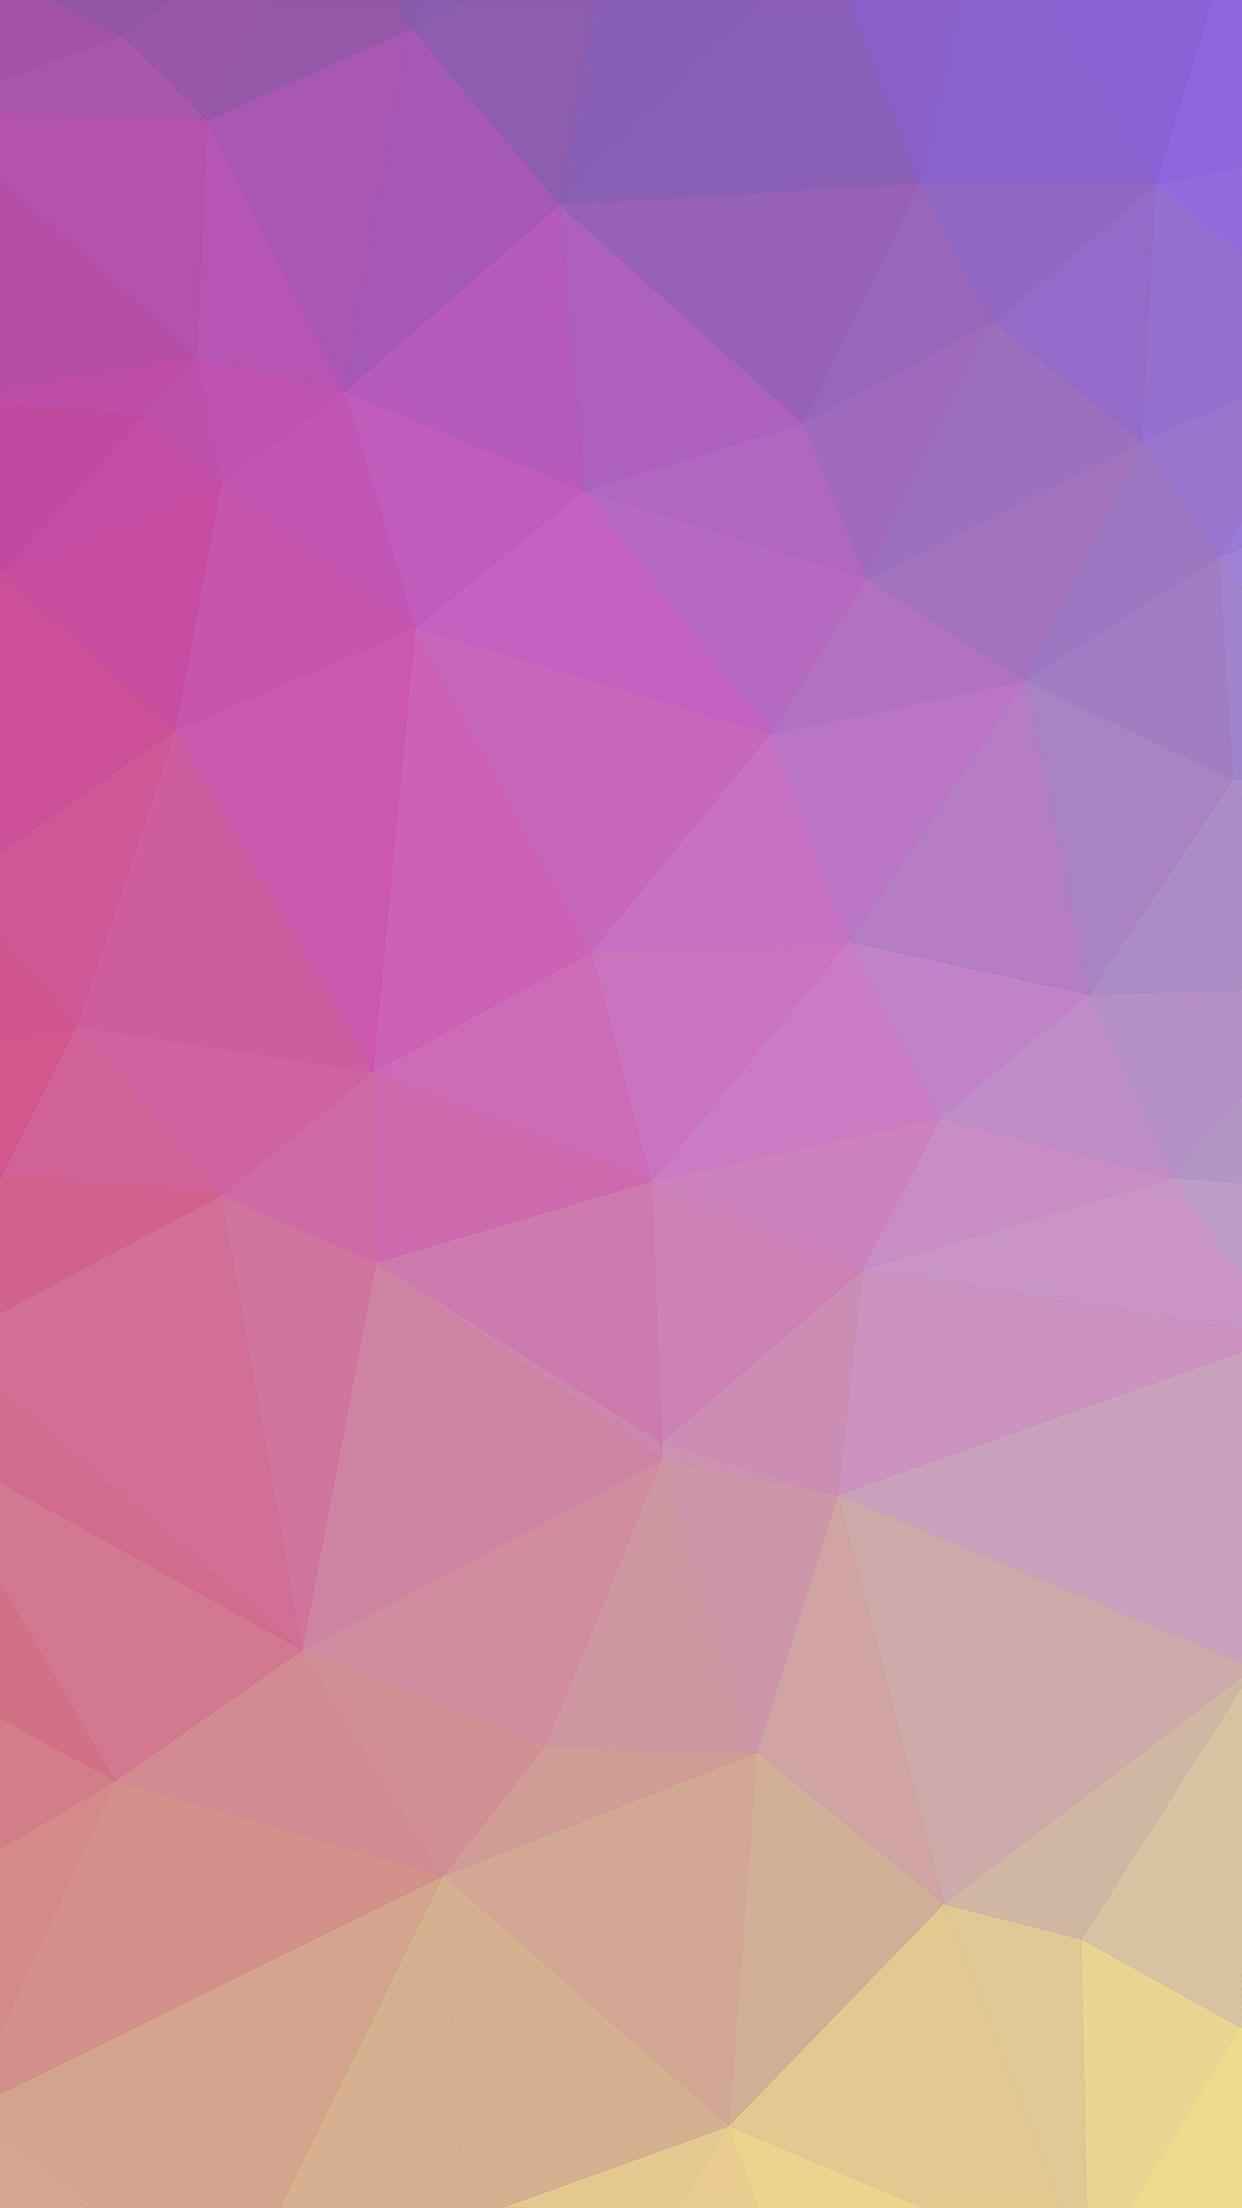 Iphone7papers Vk65 Samsung Galaxy Polyart Pastel Pink